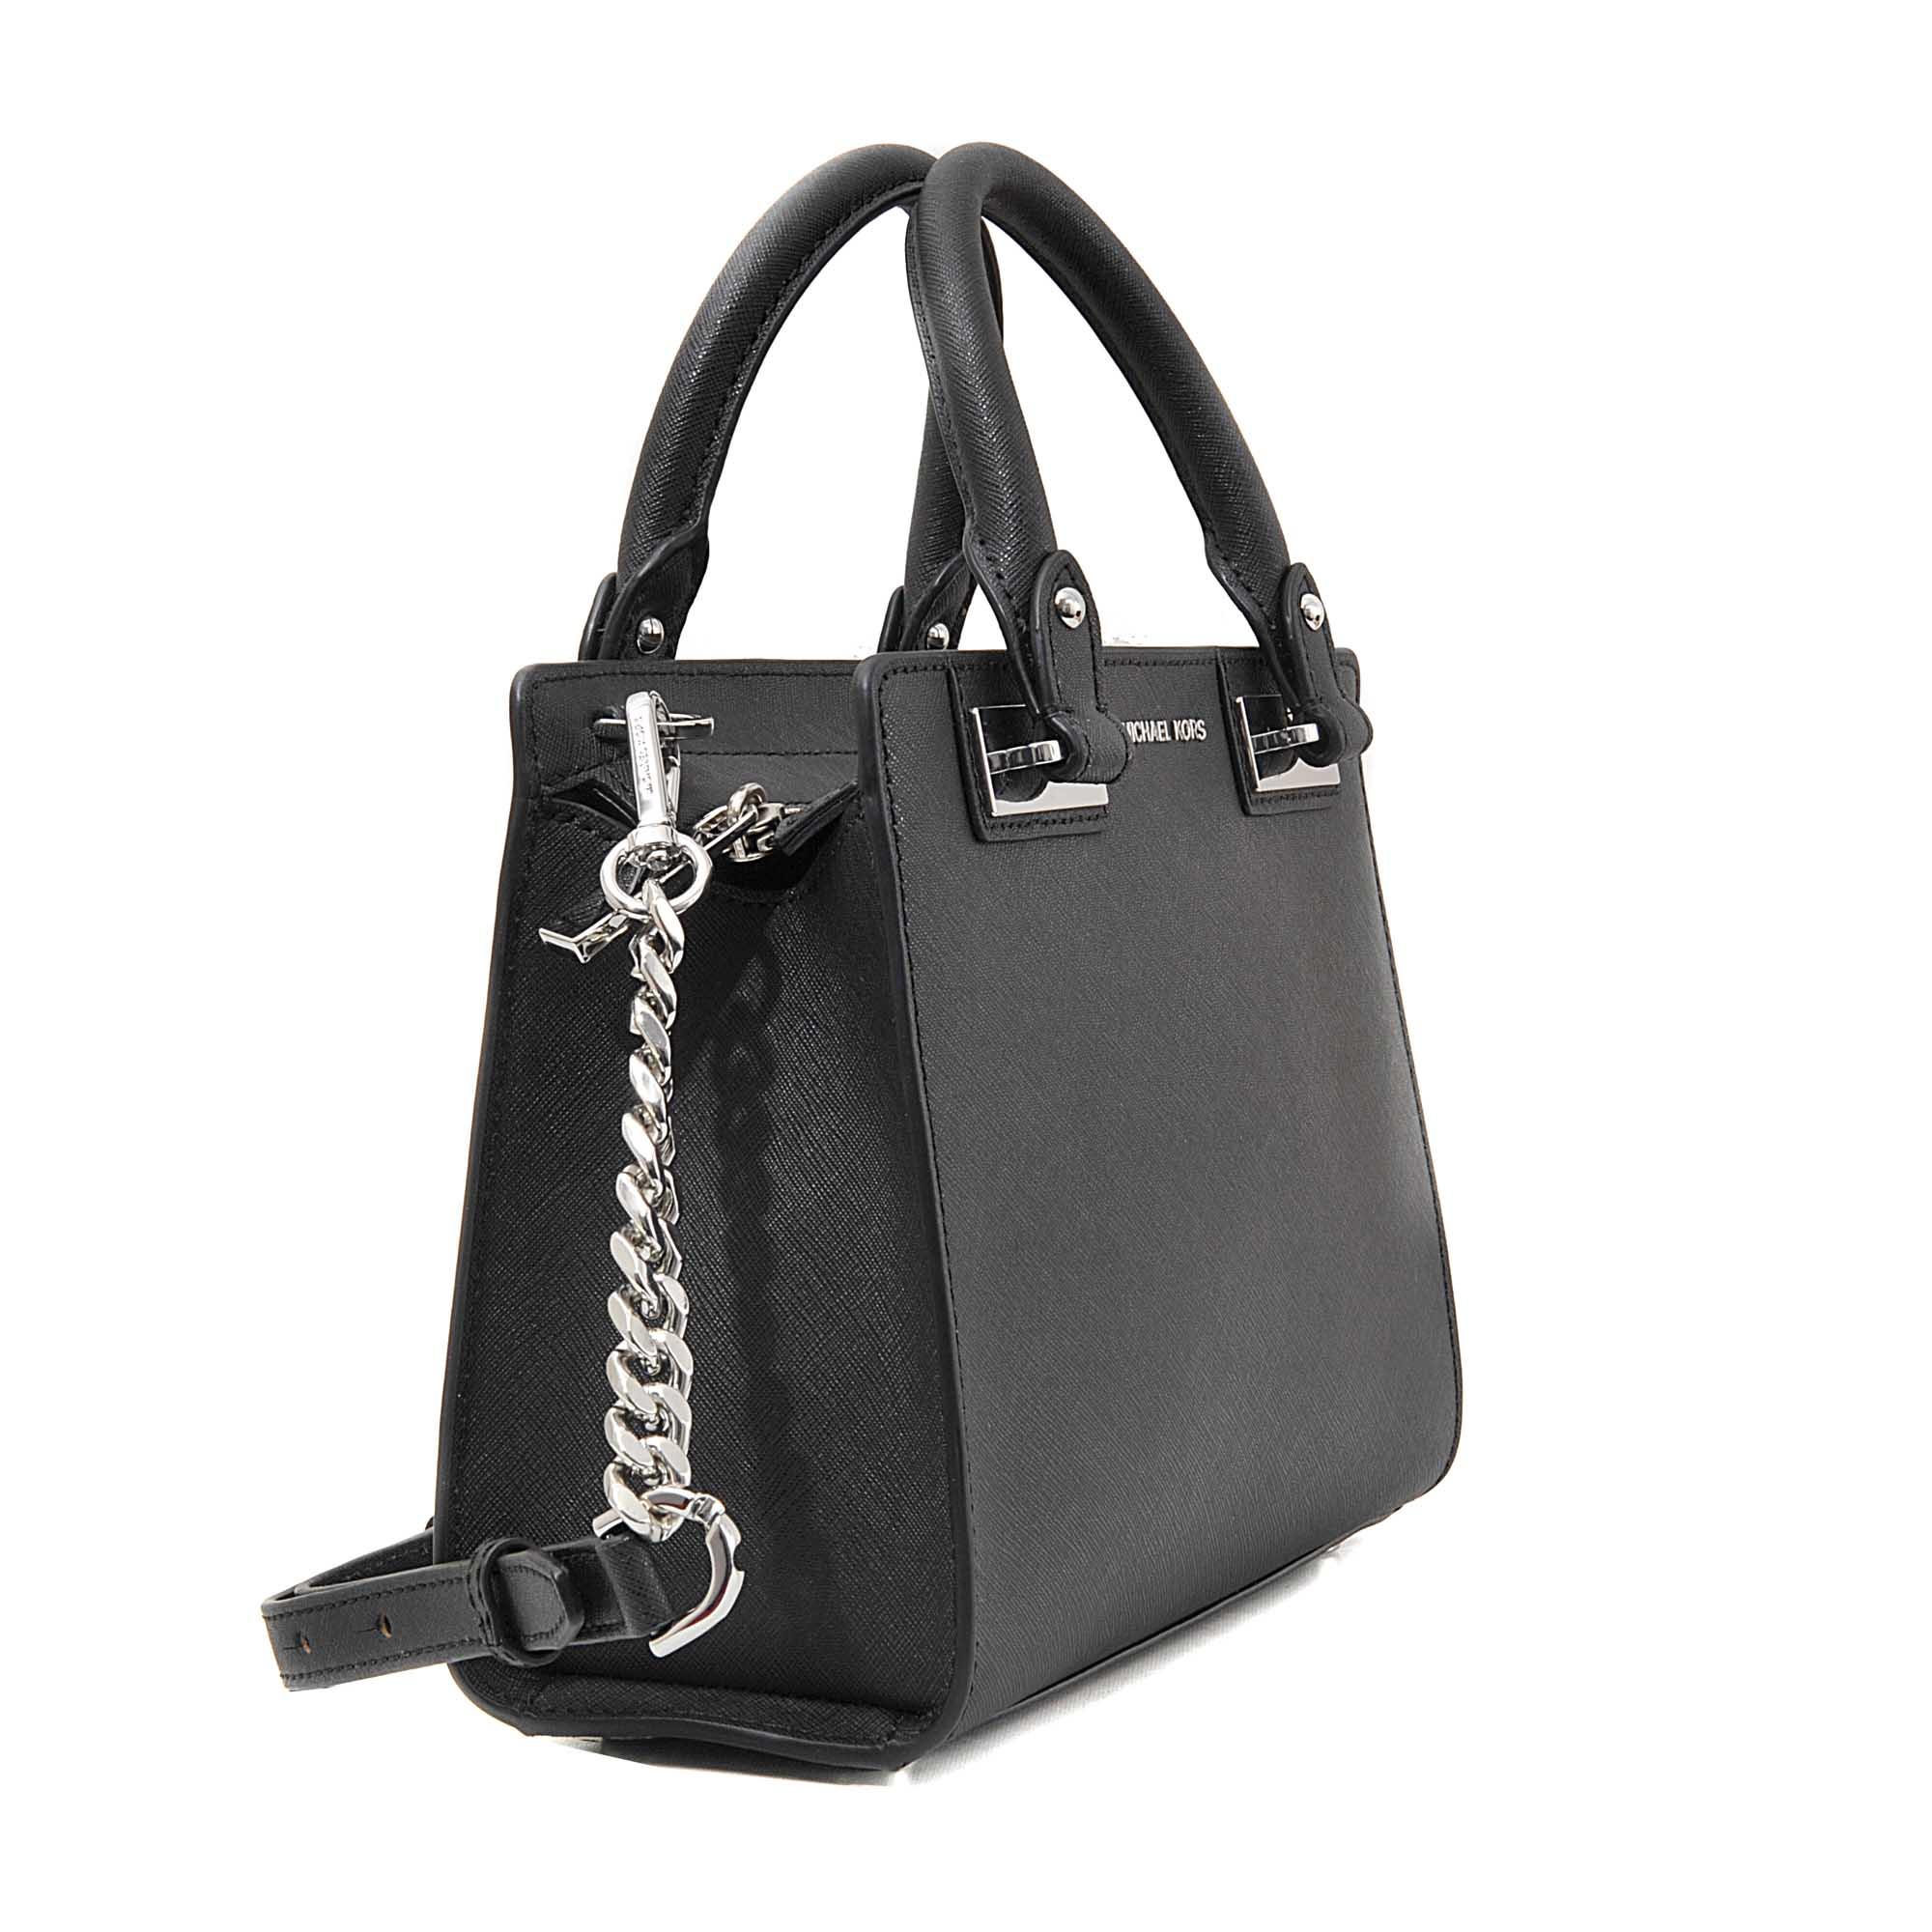 ed4e4a991dad ... discount lyst michael michael kors quinn small satchel in black 0bb37  7156f